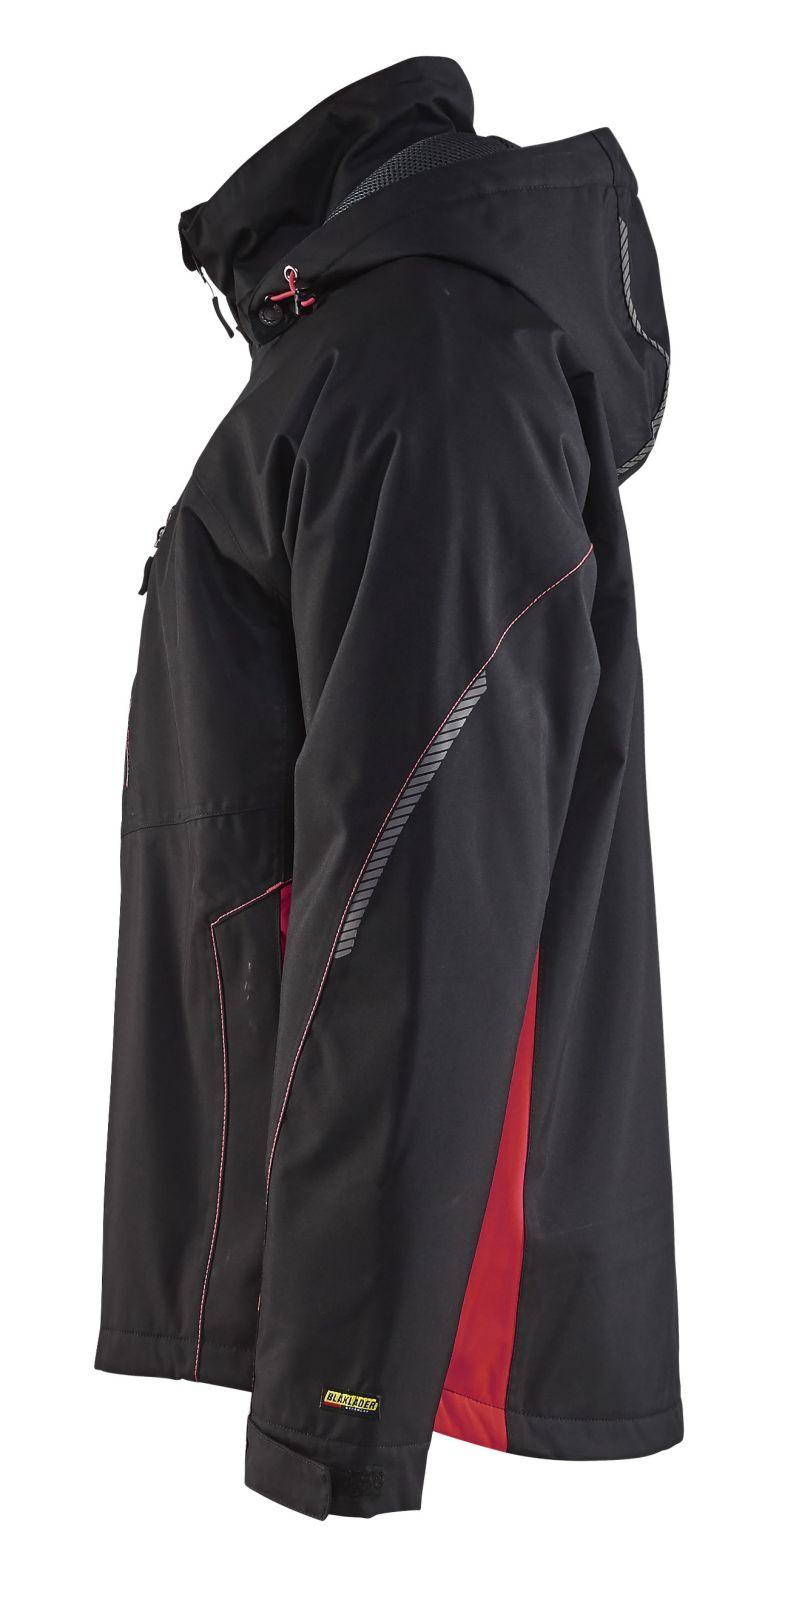 Blaklader Regenjacks 47901977 zwart-rood(9956)